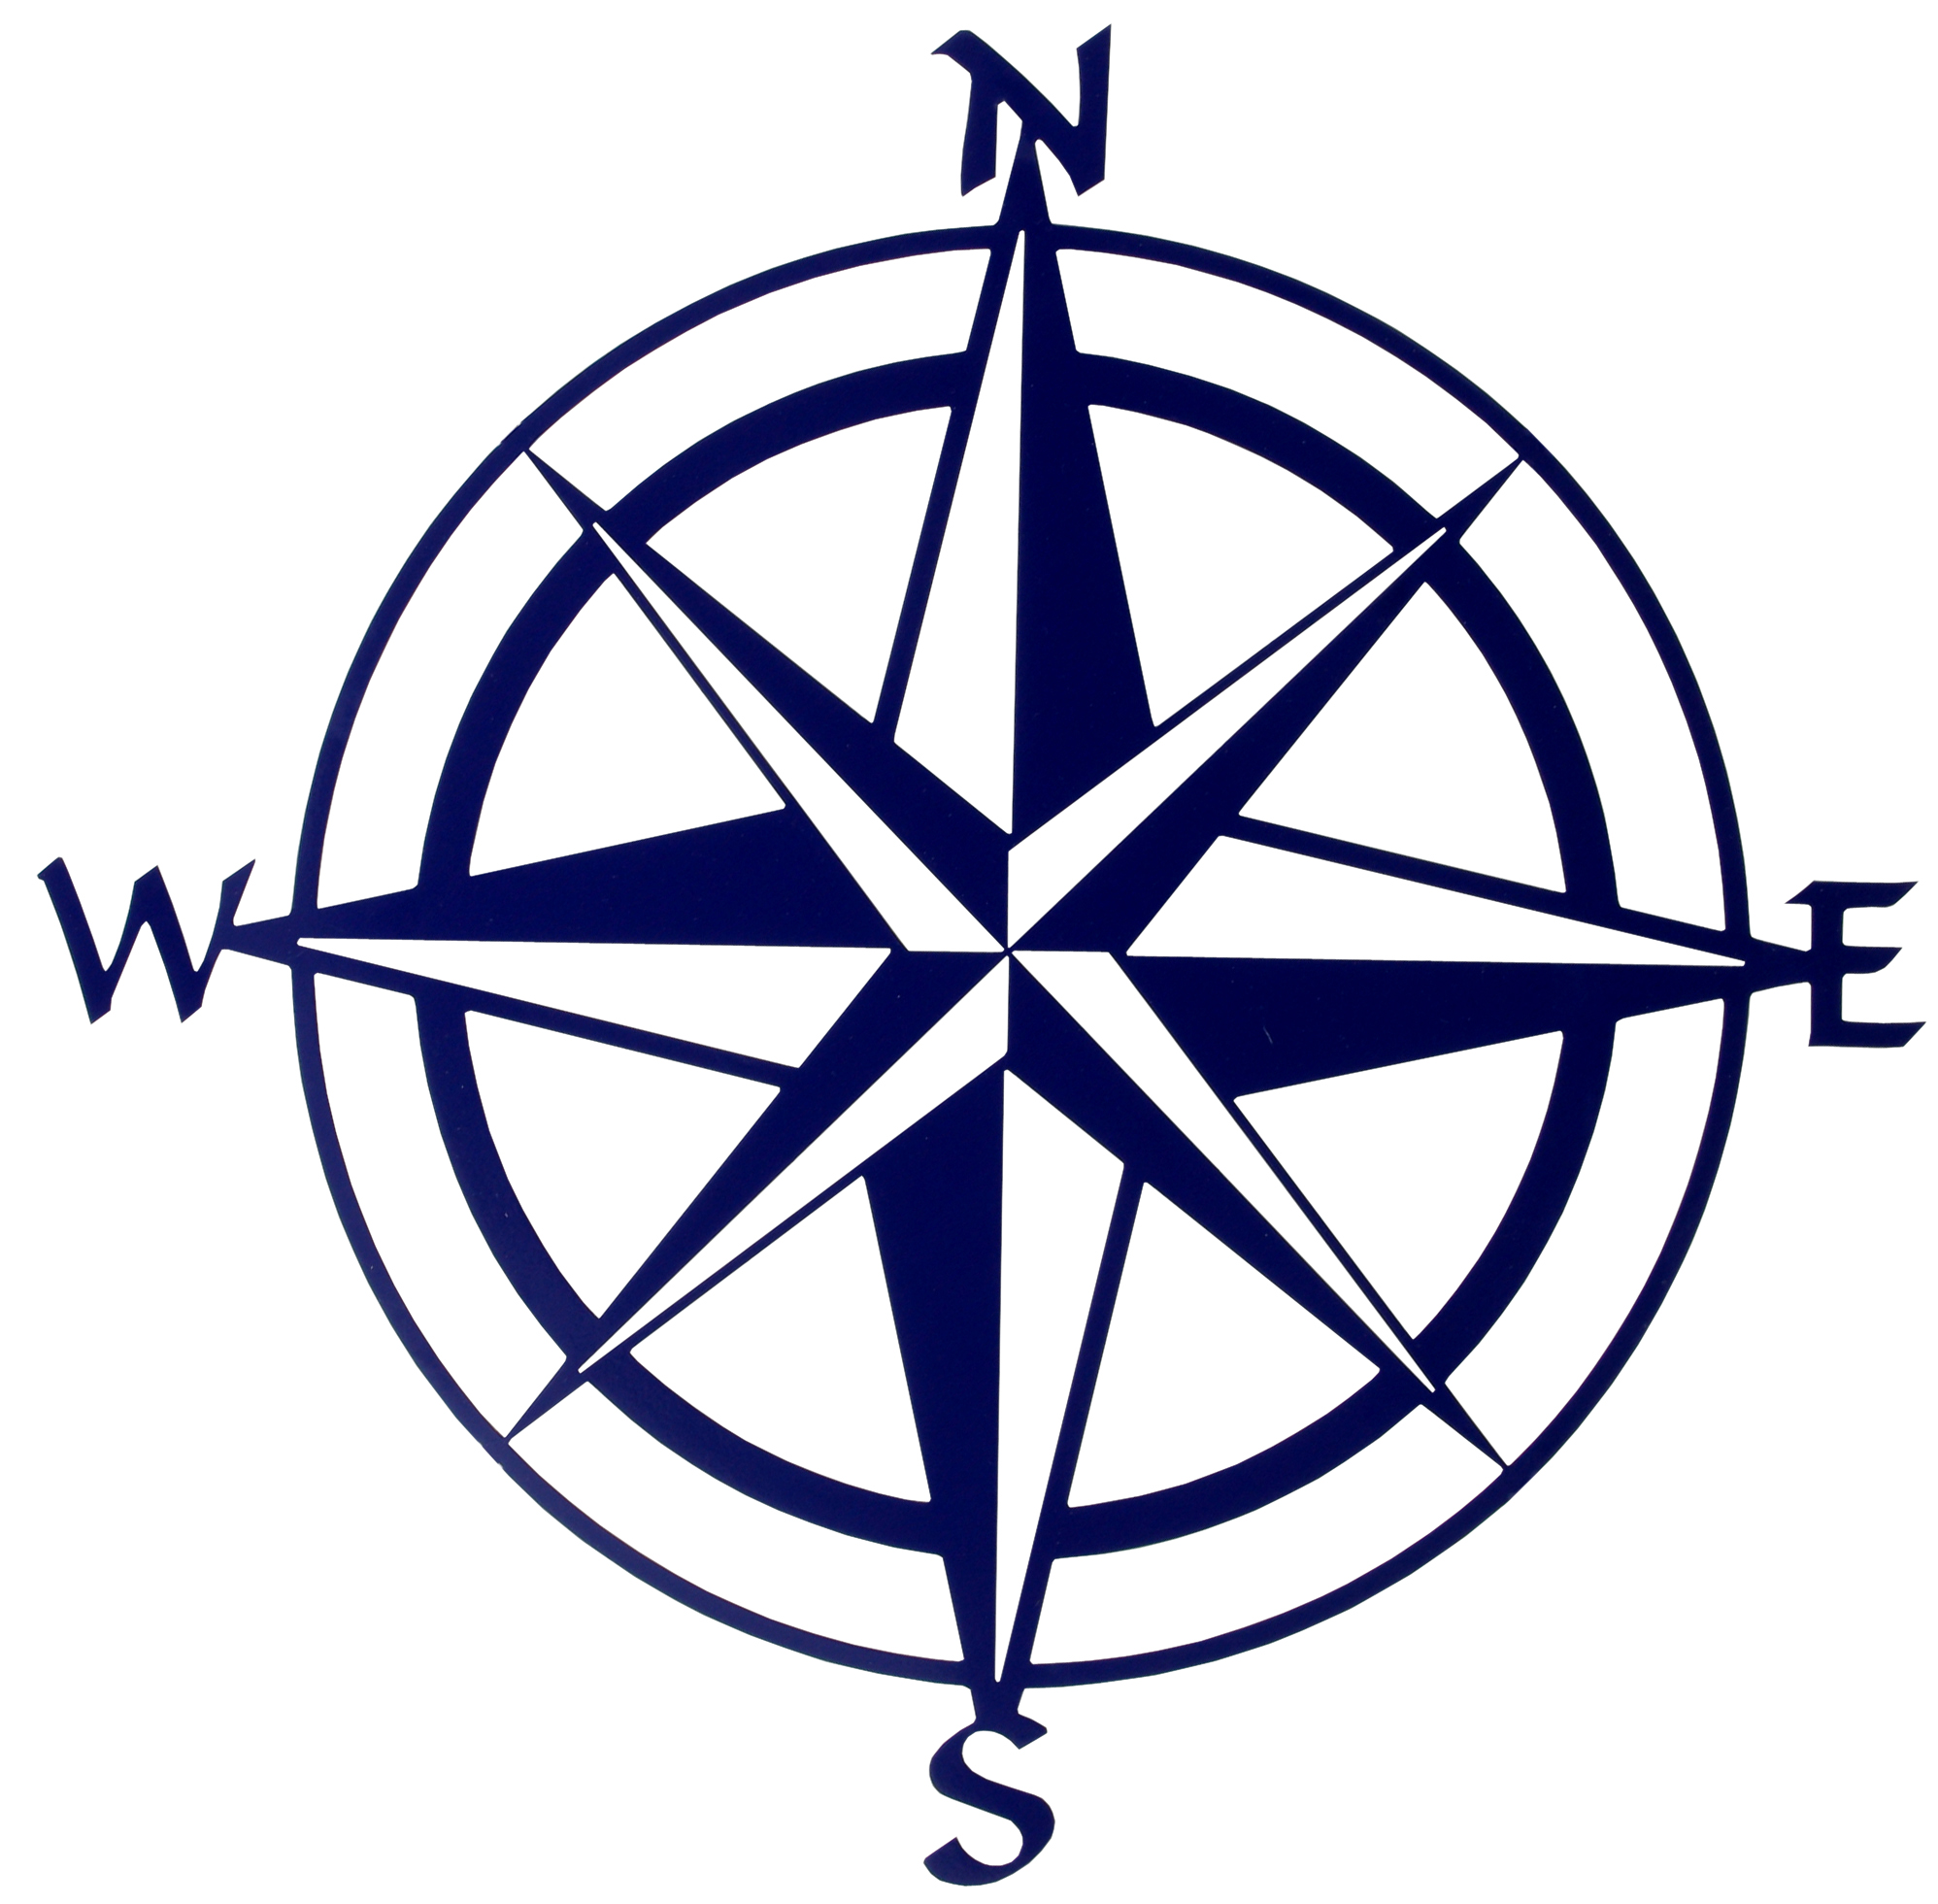 Compass Vector Clip Art Image-Compass vector clip art image-16